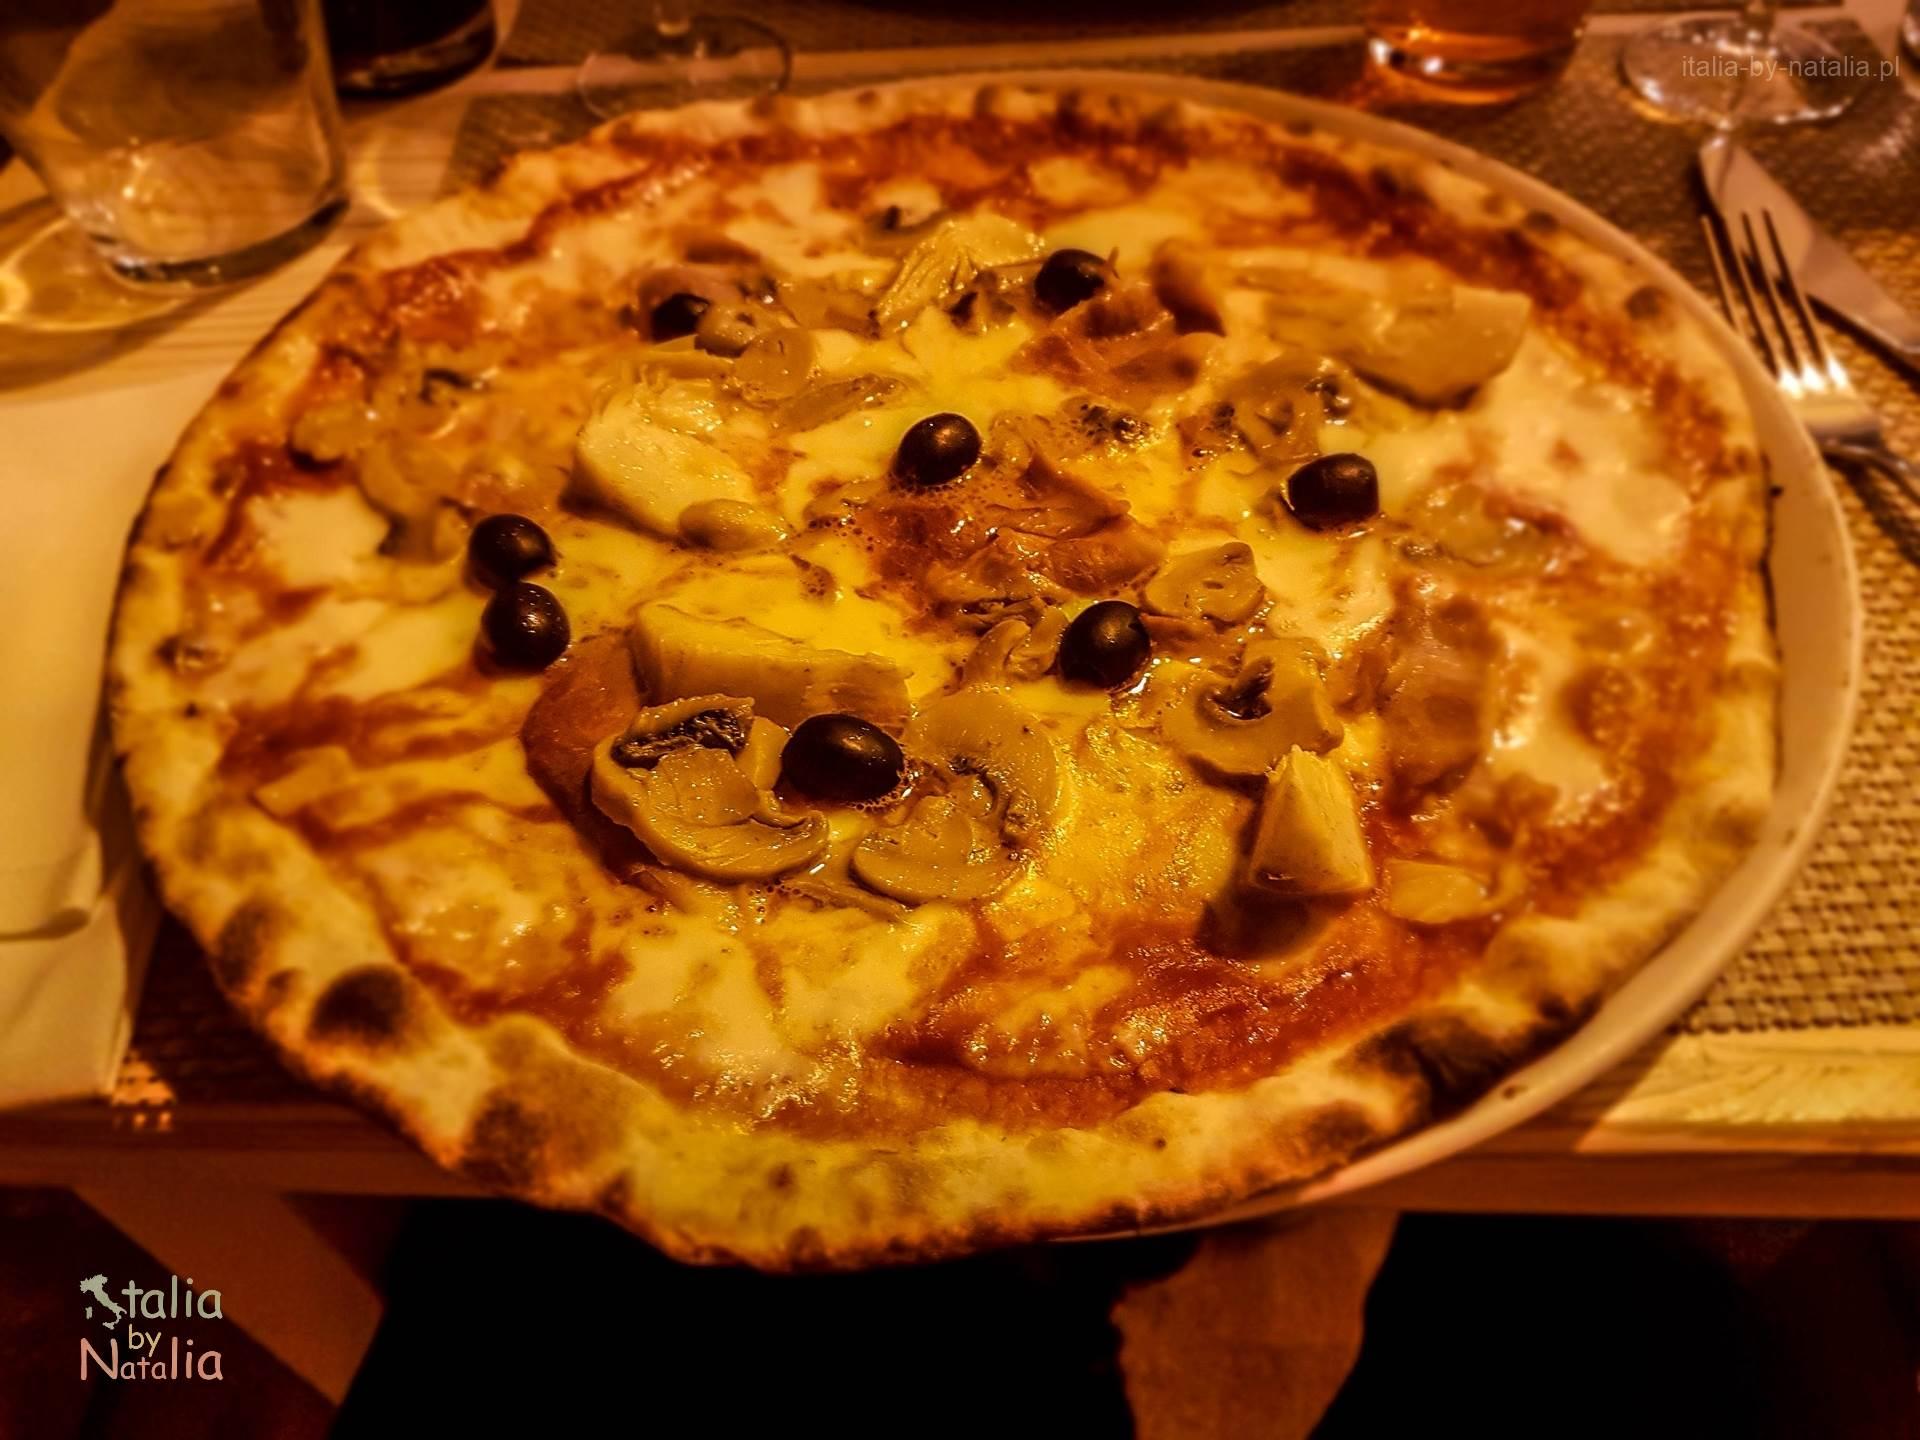 Bari Apulia pizza sprawdzona restauracja stare miasto